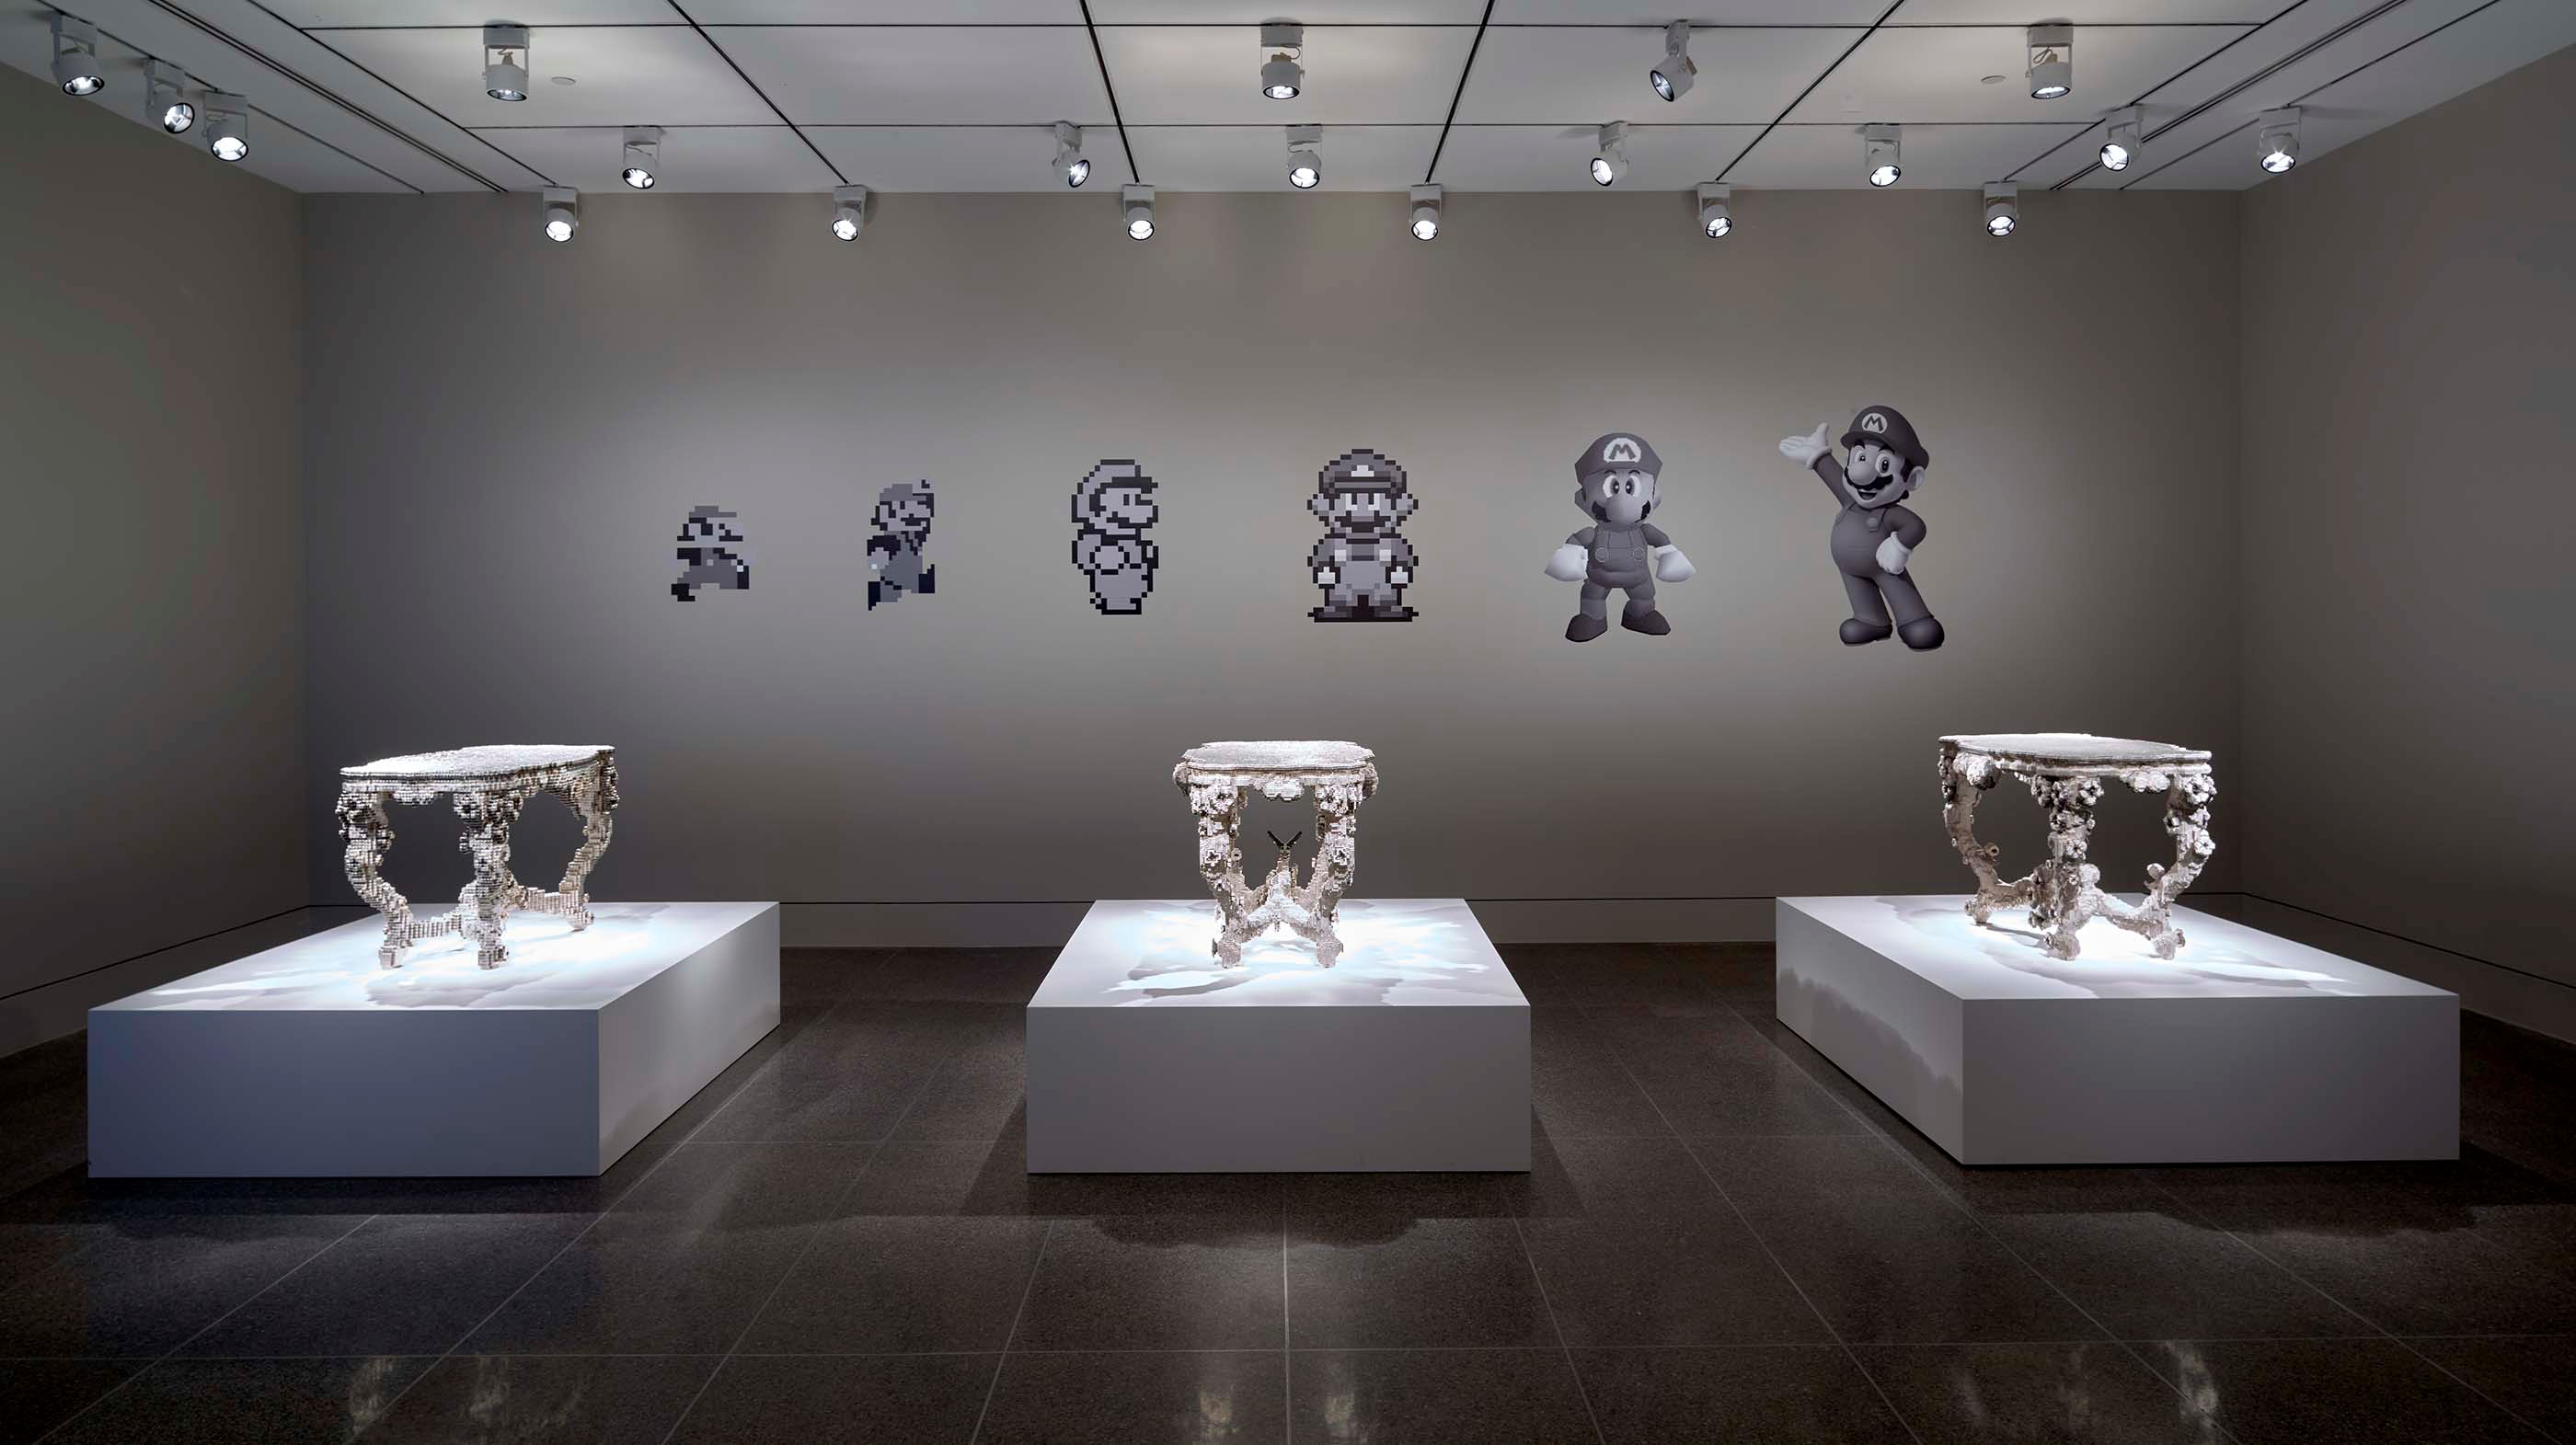 Installation view of Joris Laarman Lab: Design in the Digital Age - Voxel tables / Nintendo room